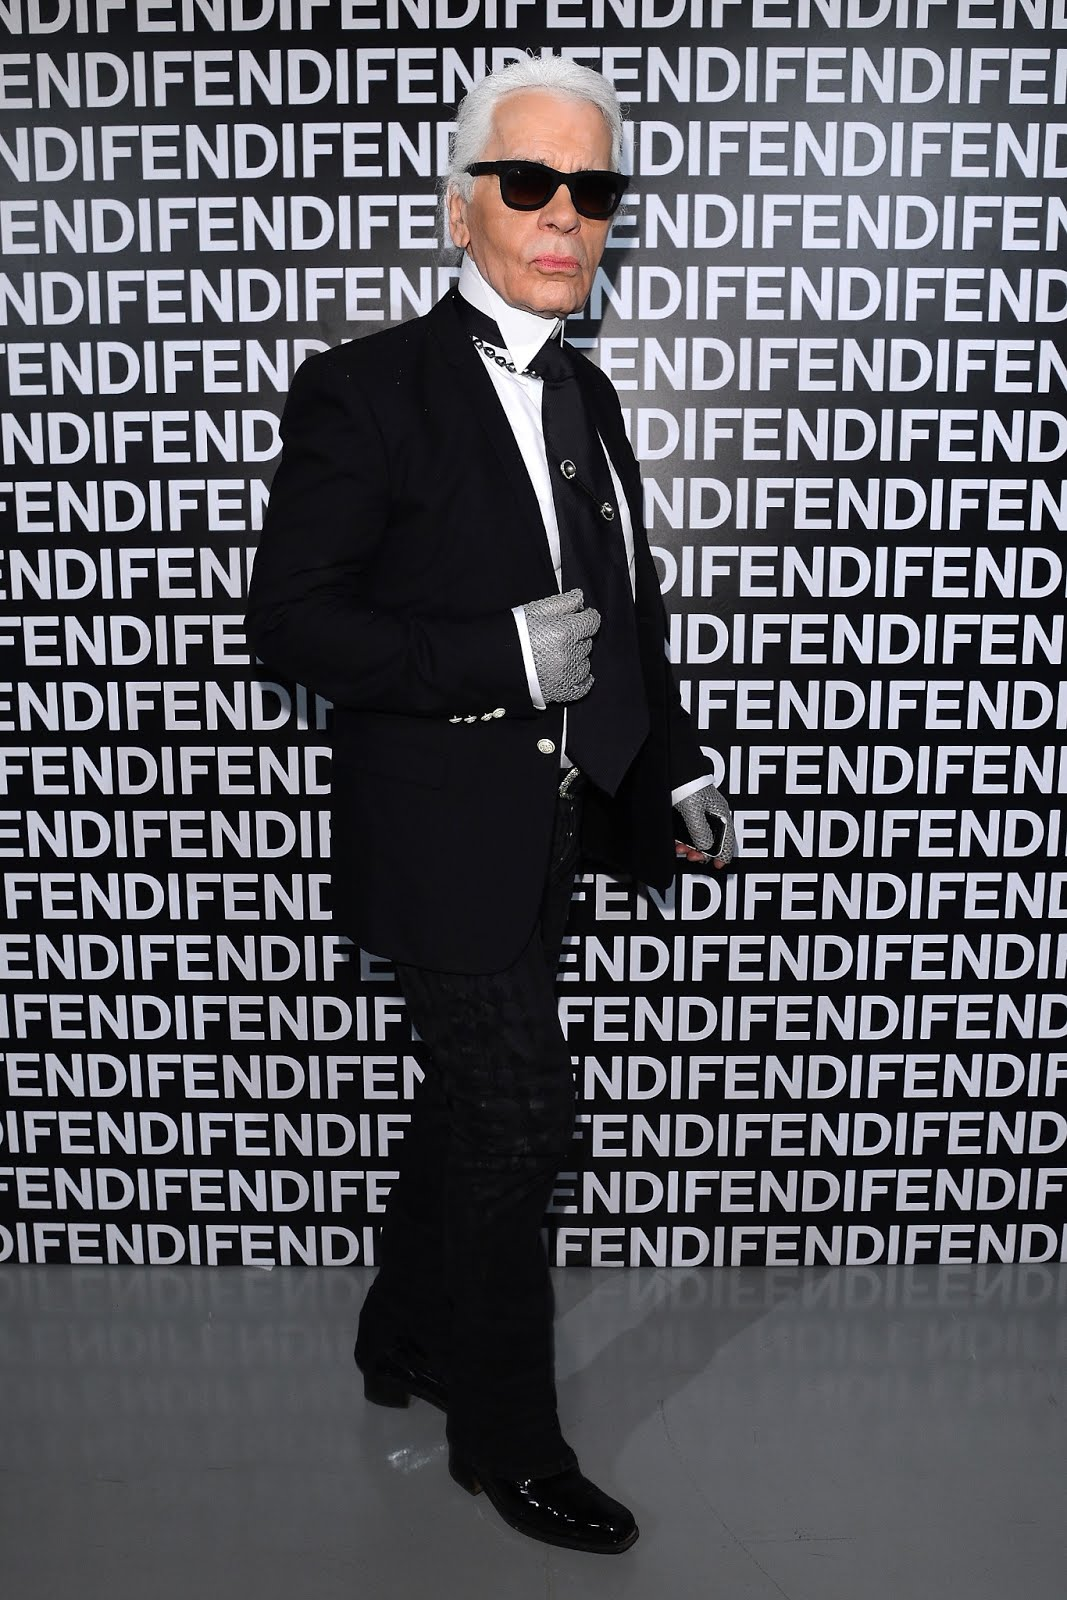 Karl Lagerfeld @ FENDI FW 13-14 Fashion Show.